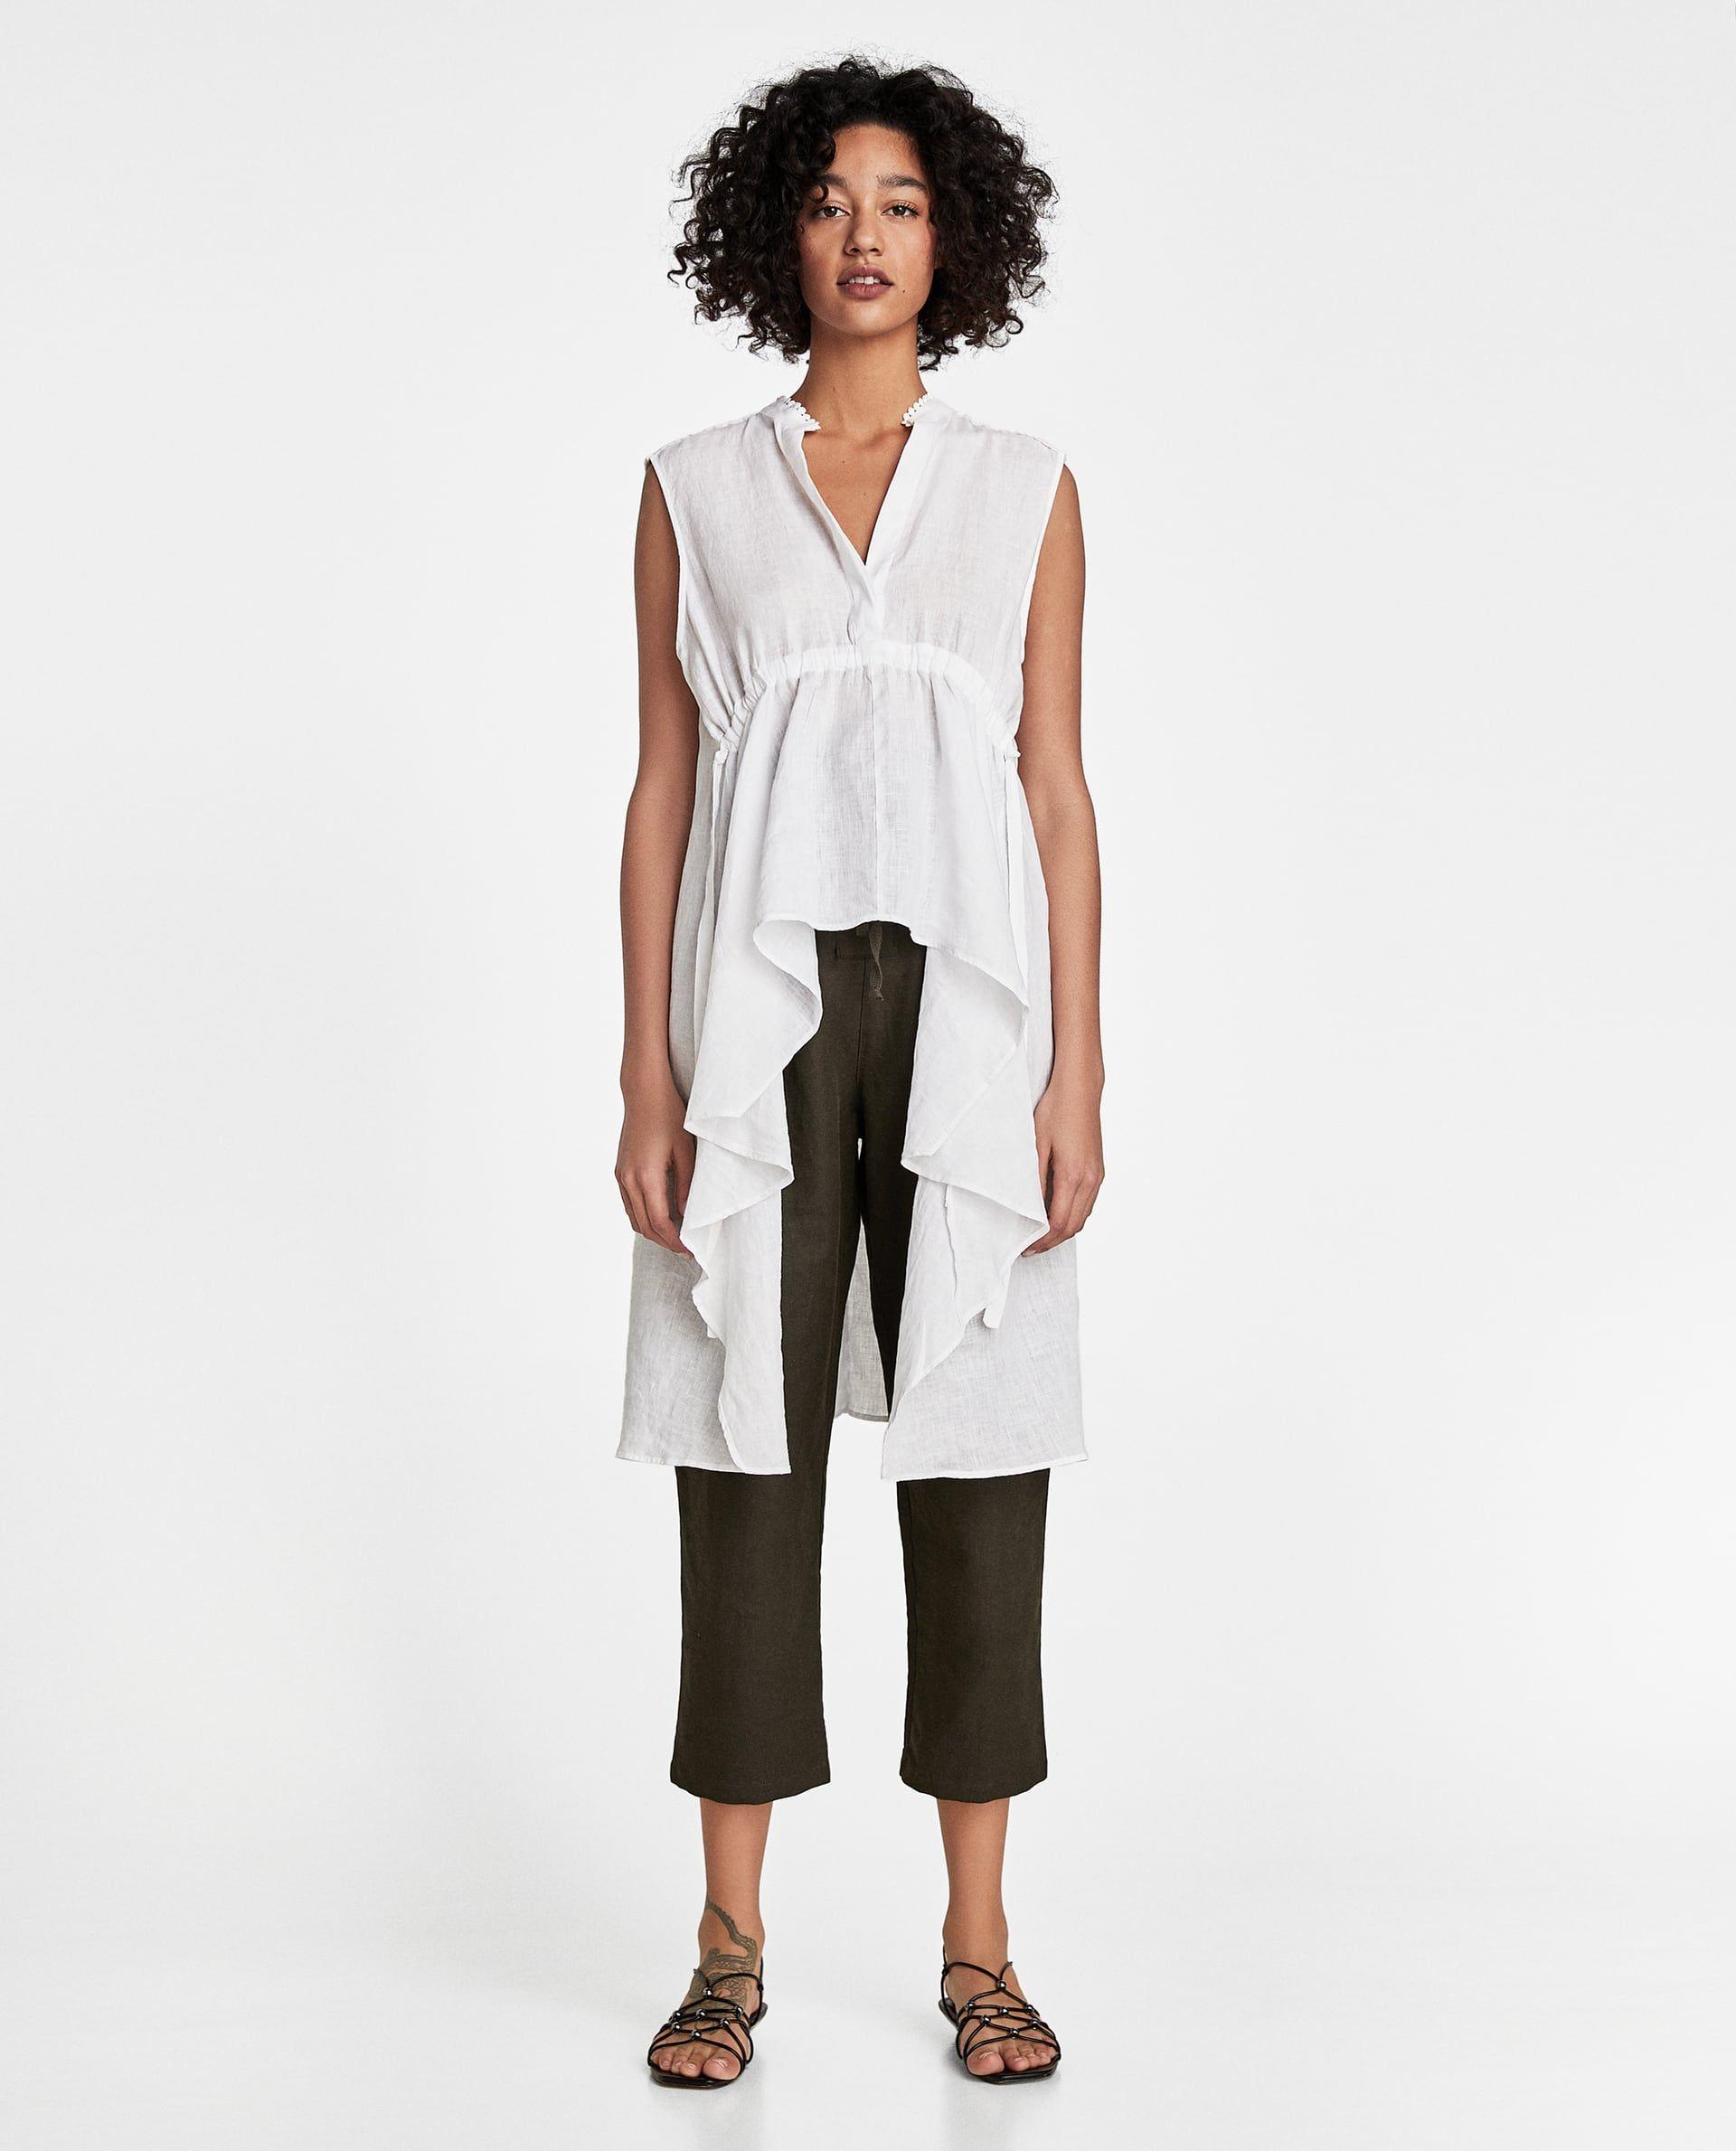 6d4bb895710 TÚNICA LINO ASIMÉTRICA   Projects to Try   Linen tunic, Zara women ...